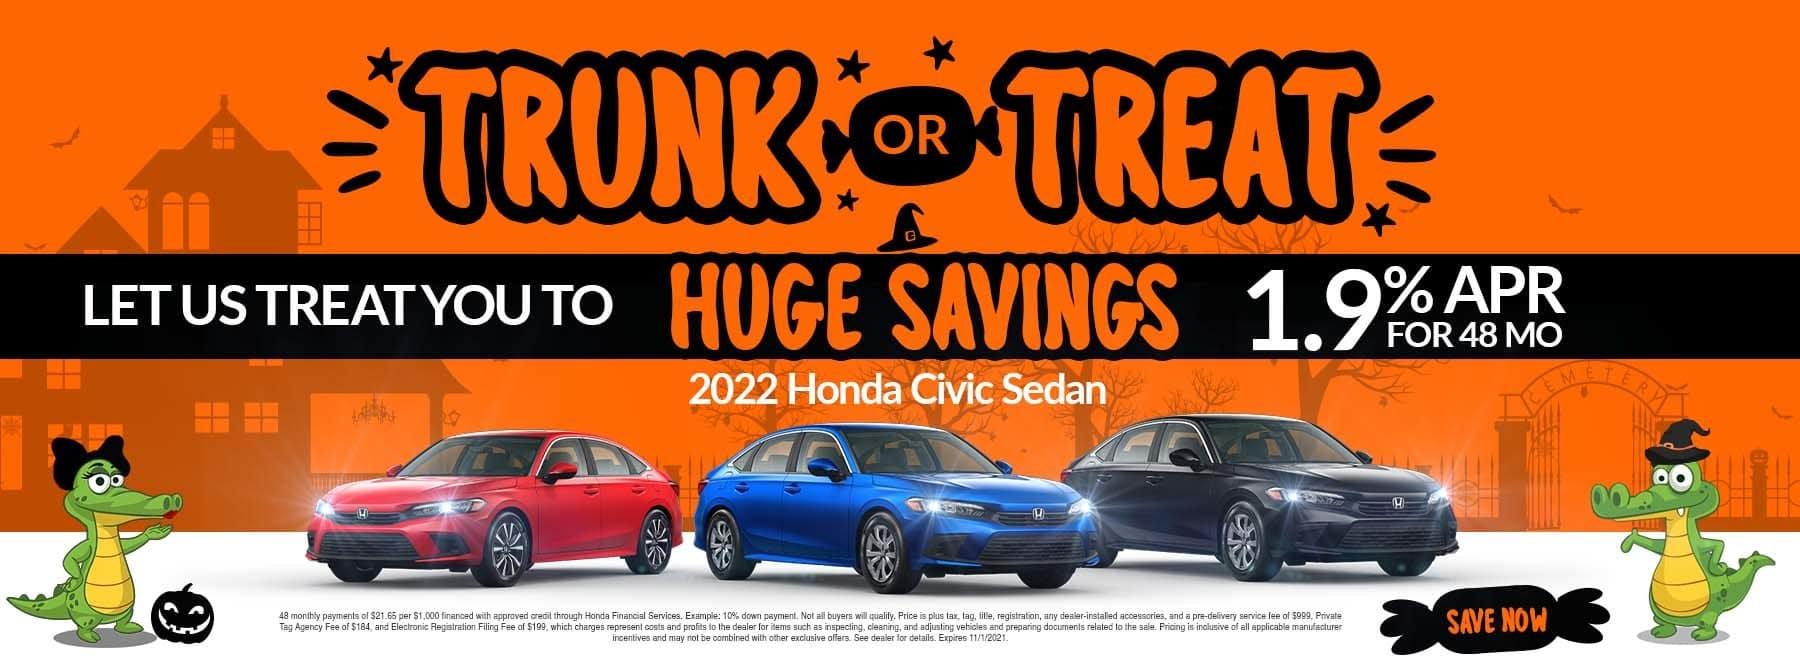 Trunk Or Treat | Let Us Treat You To Huge Savings | 2022 Honda Civic Sedan | 1.9% APR For 48 Months